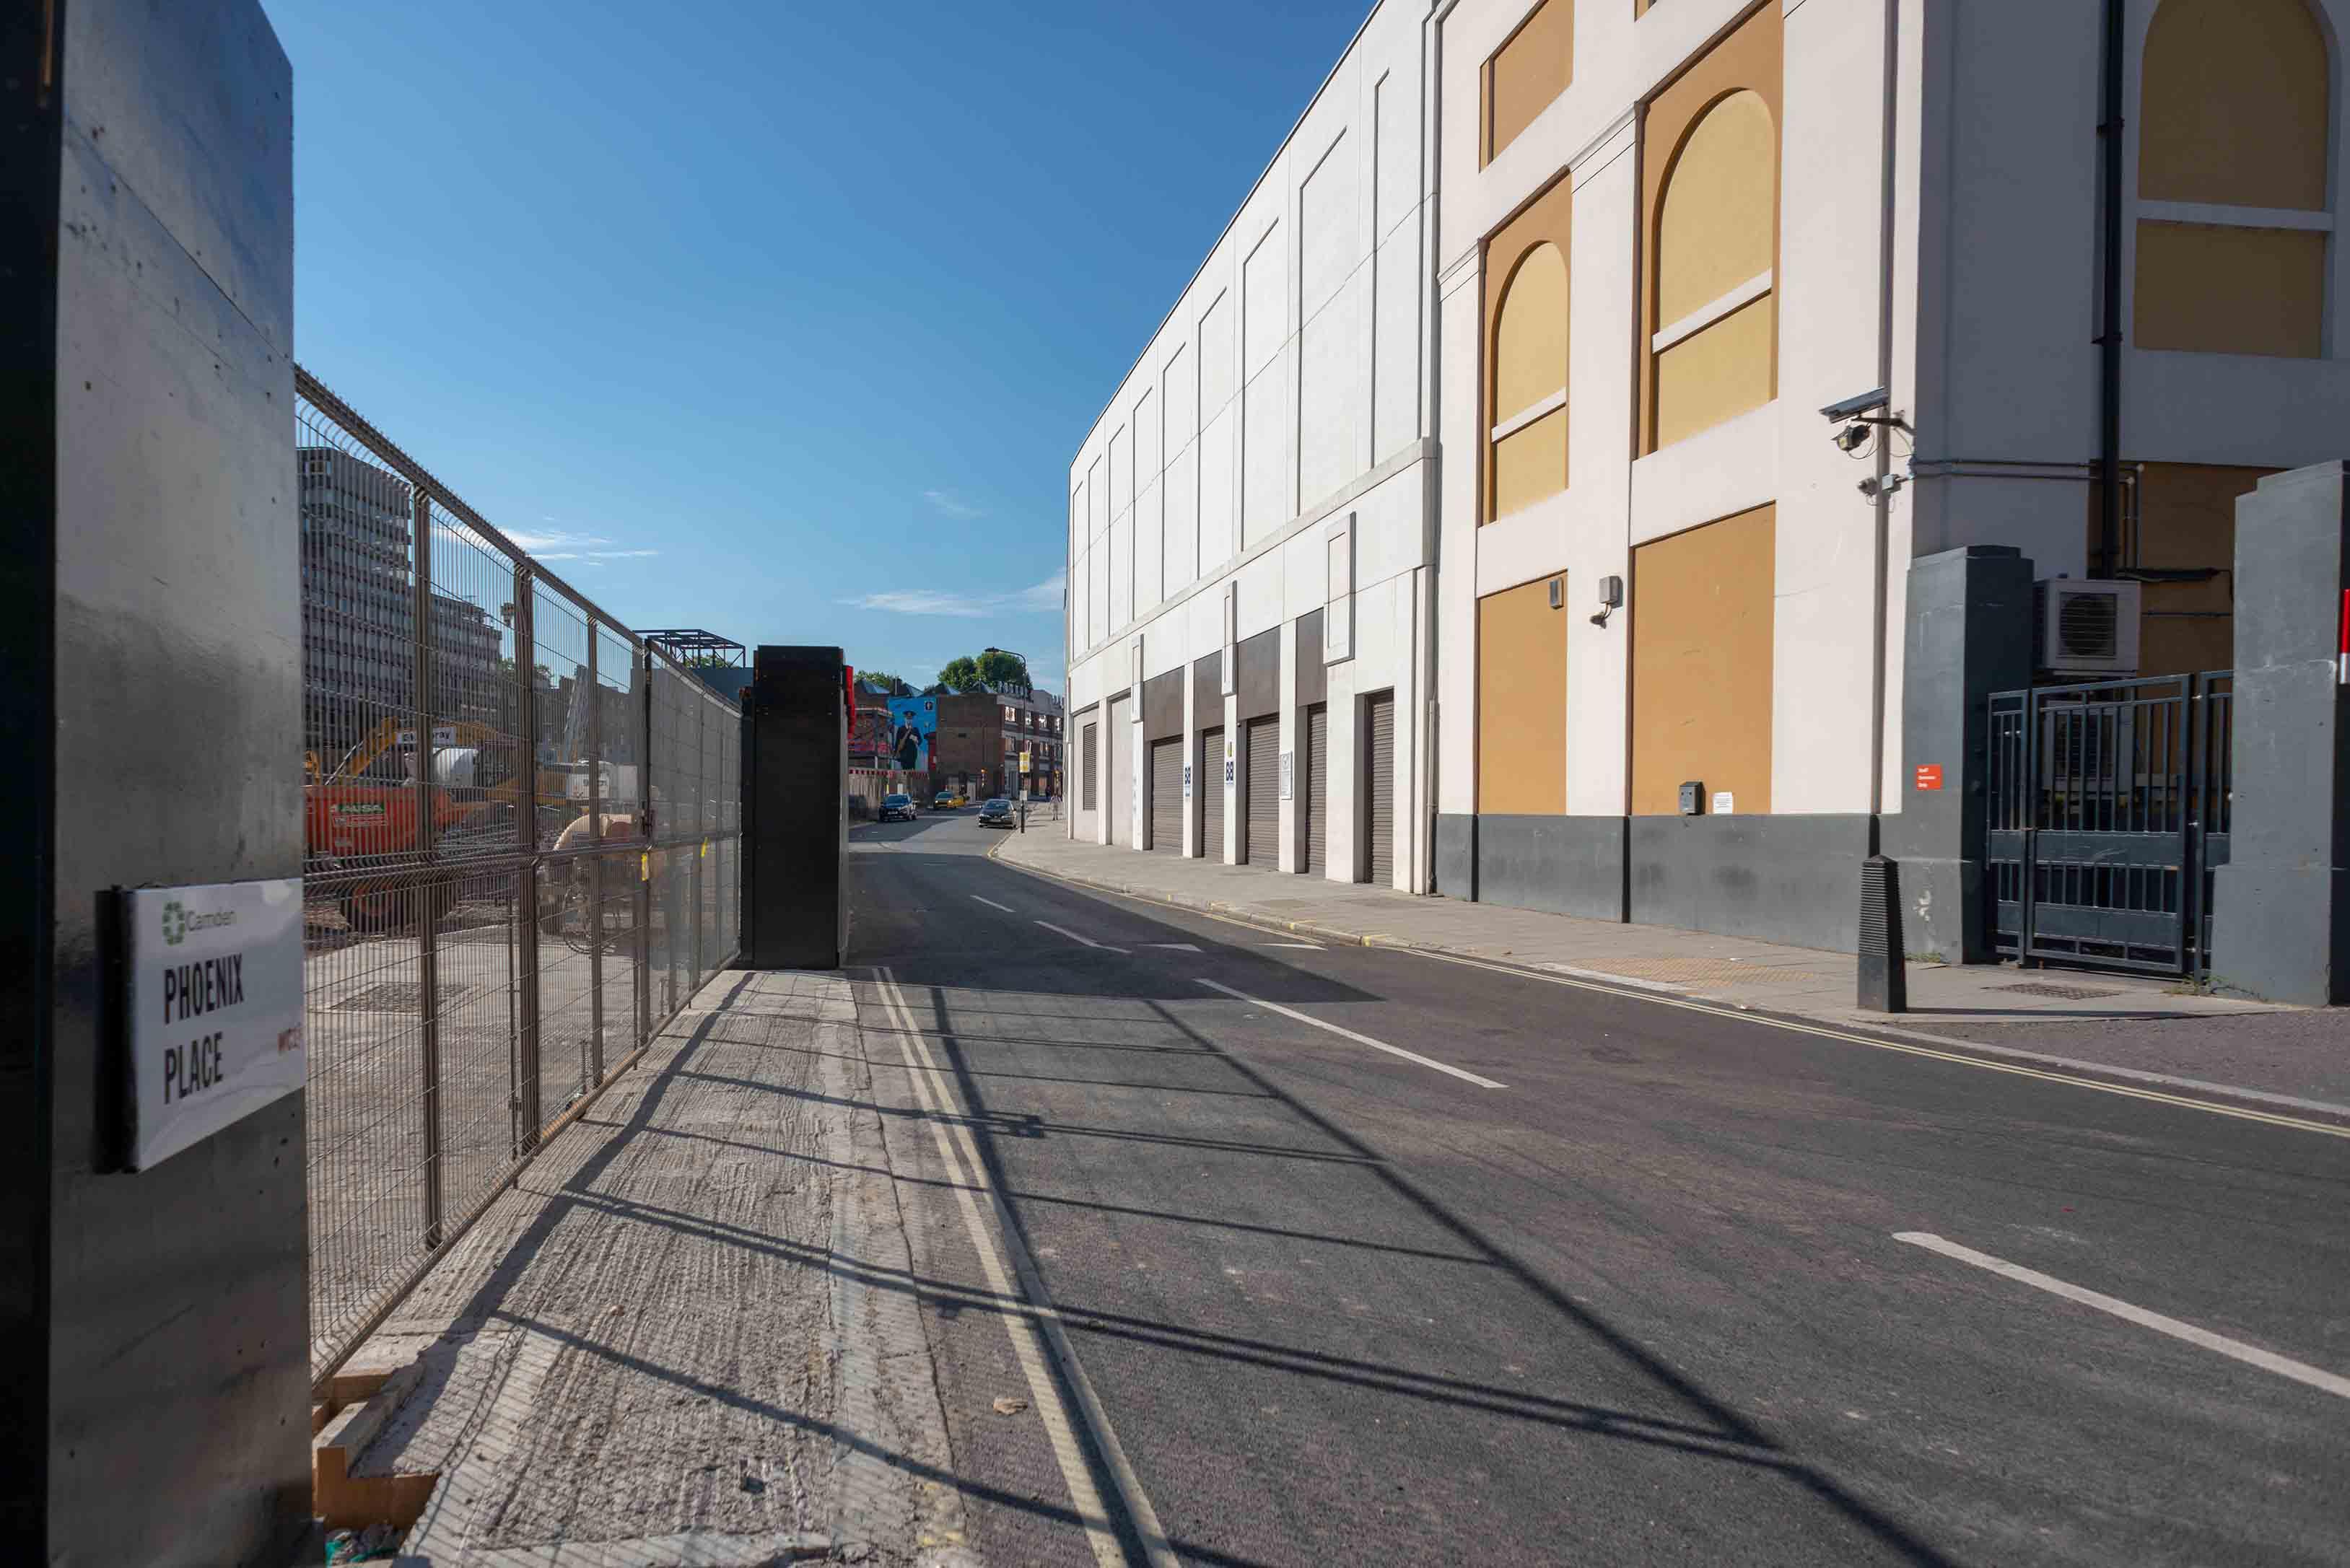 Entrance to Royal Mail Mount Pleasant construction site